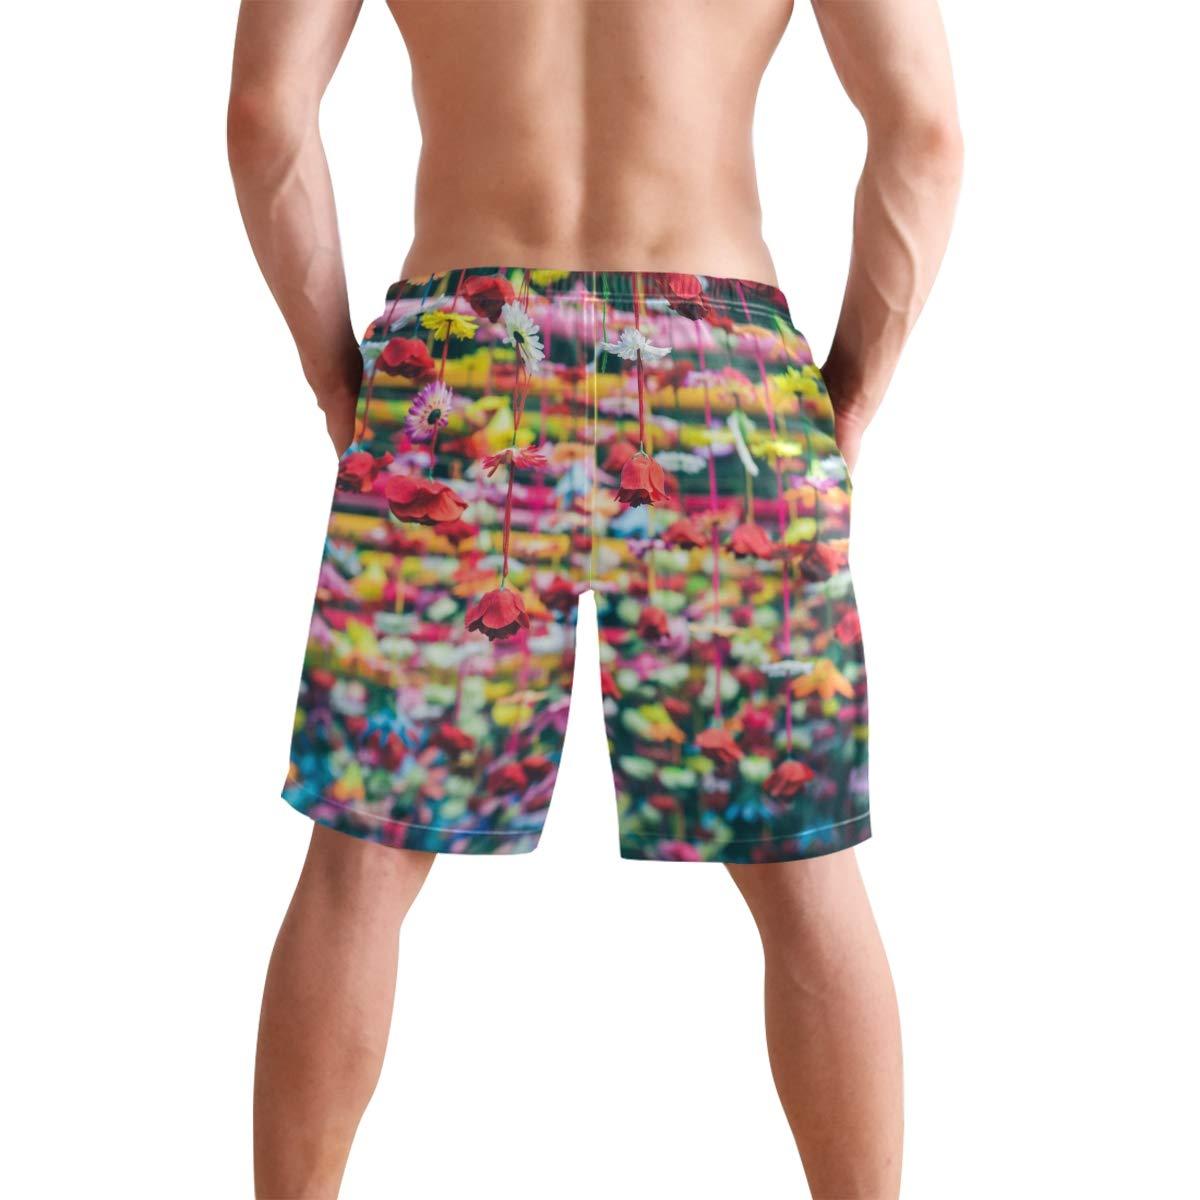 CiCily Men/'s Swim Trunks Colorful Flower Beach Board Shorts Swimming Short Pants Running Sports Surffing Shorts